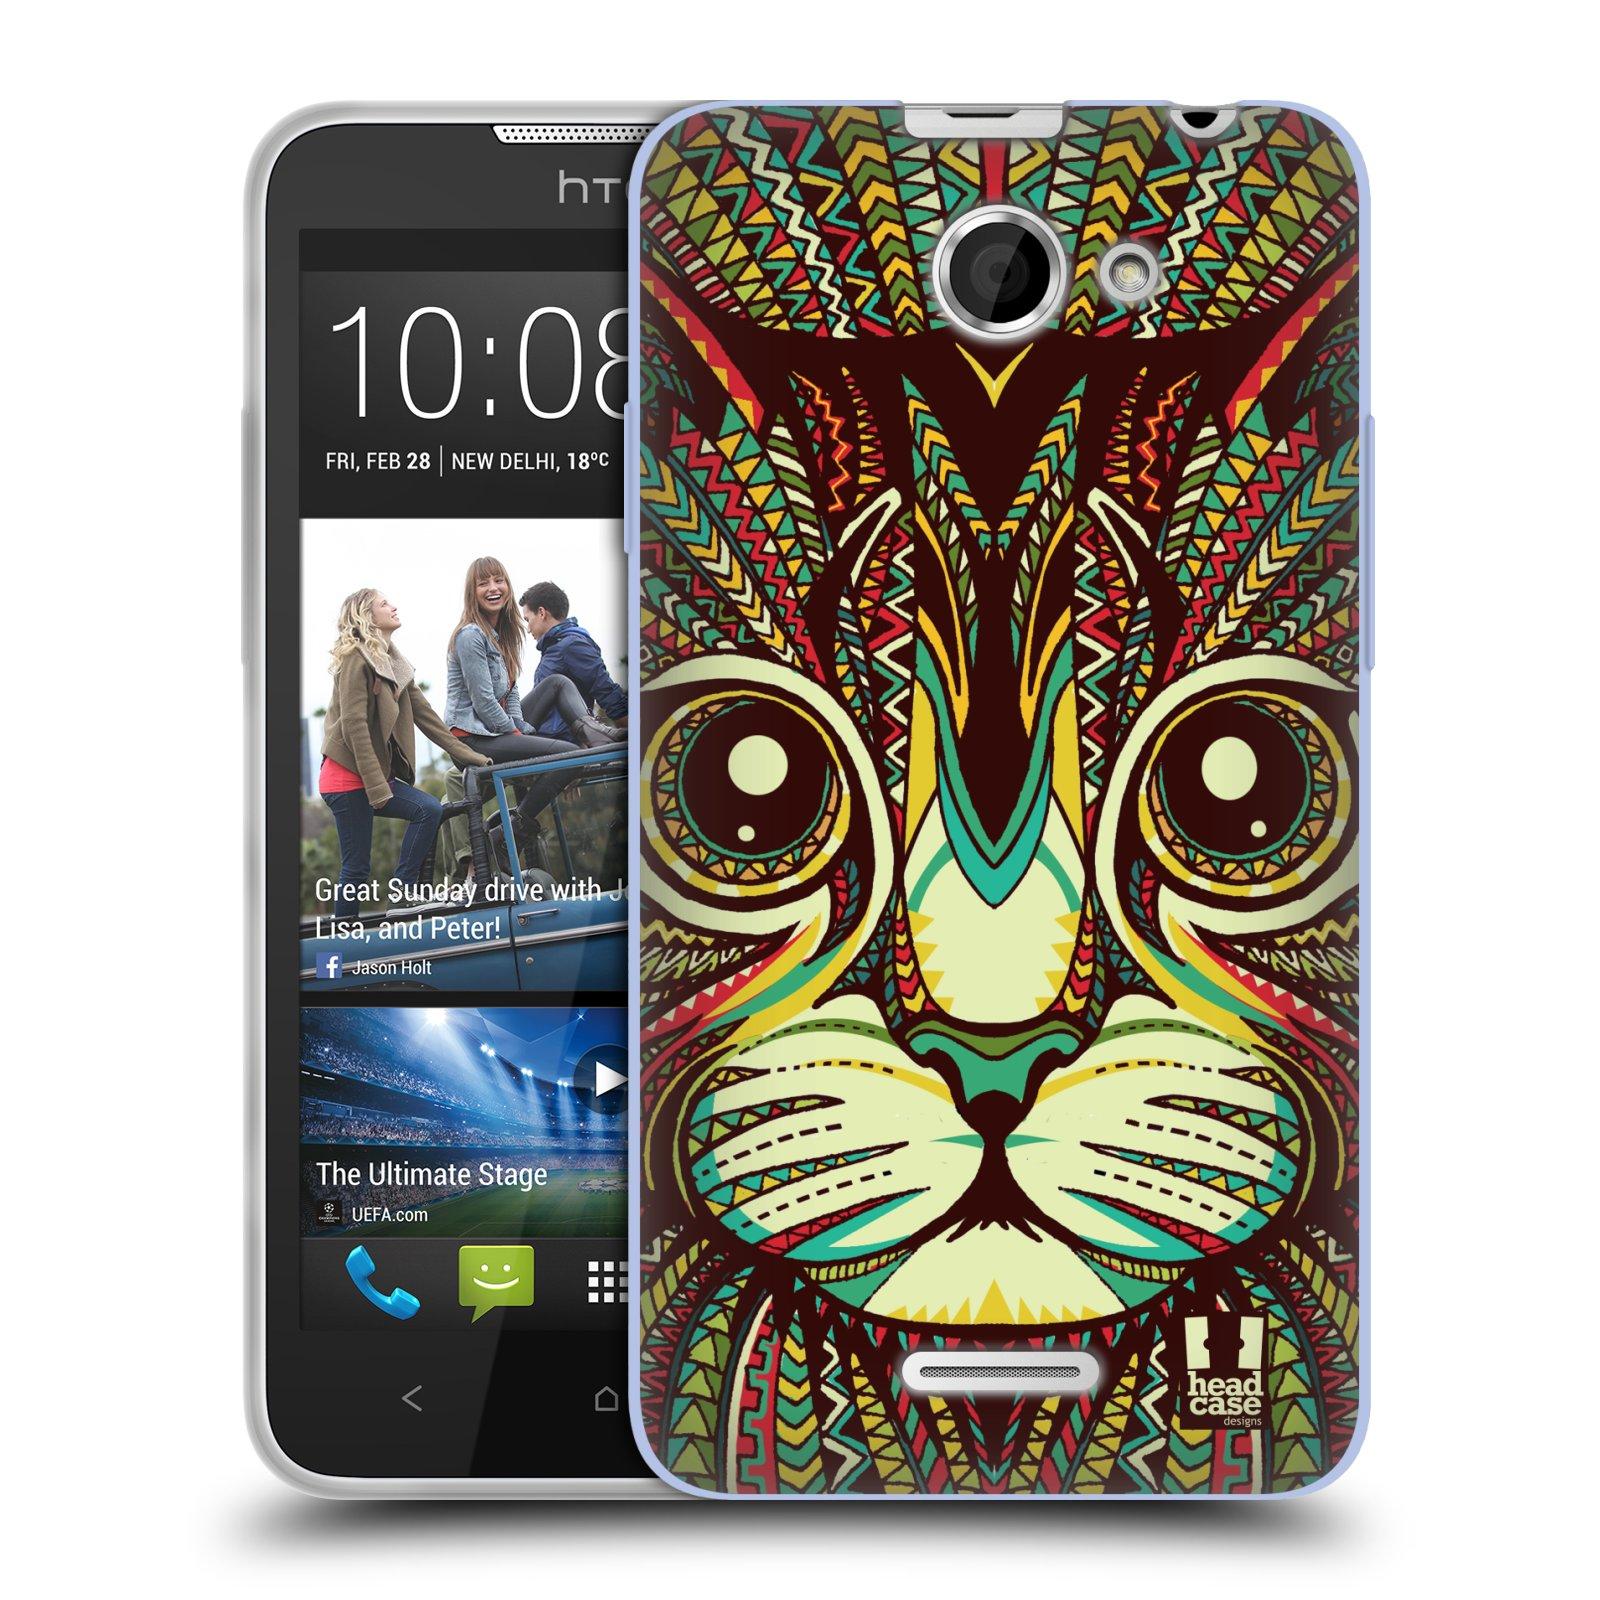 Silikonové pouzdro na mobil HTC Desire 516 HEAD CASE AZTEC KOČKA (Silikonový kryt či obal na mobilní telefon HTC Desire 516 Dual SIM)